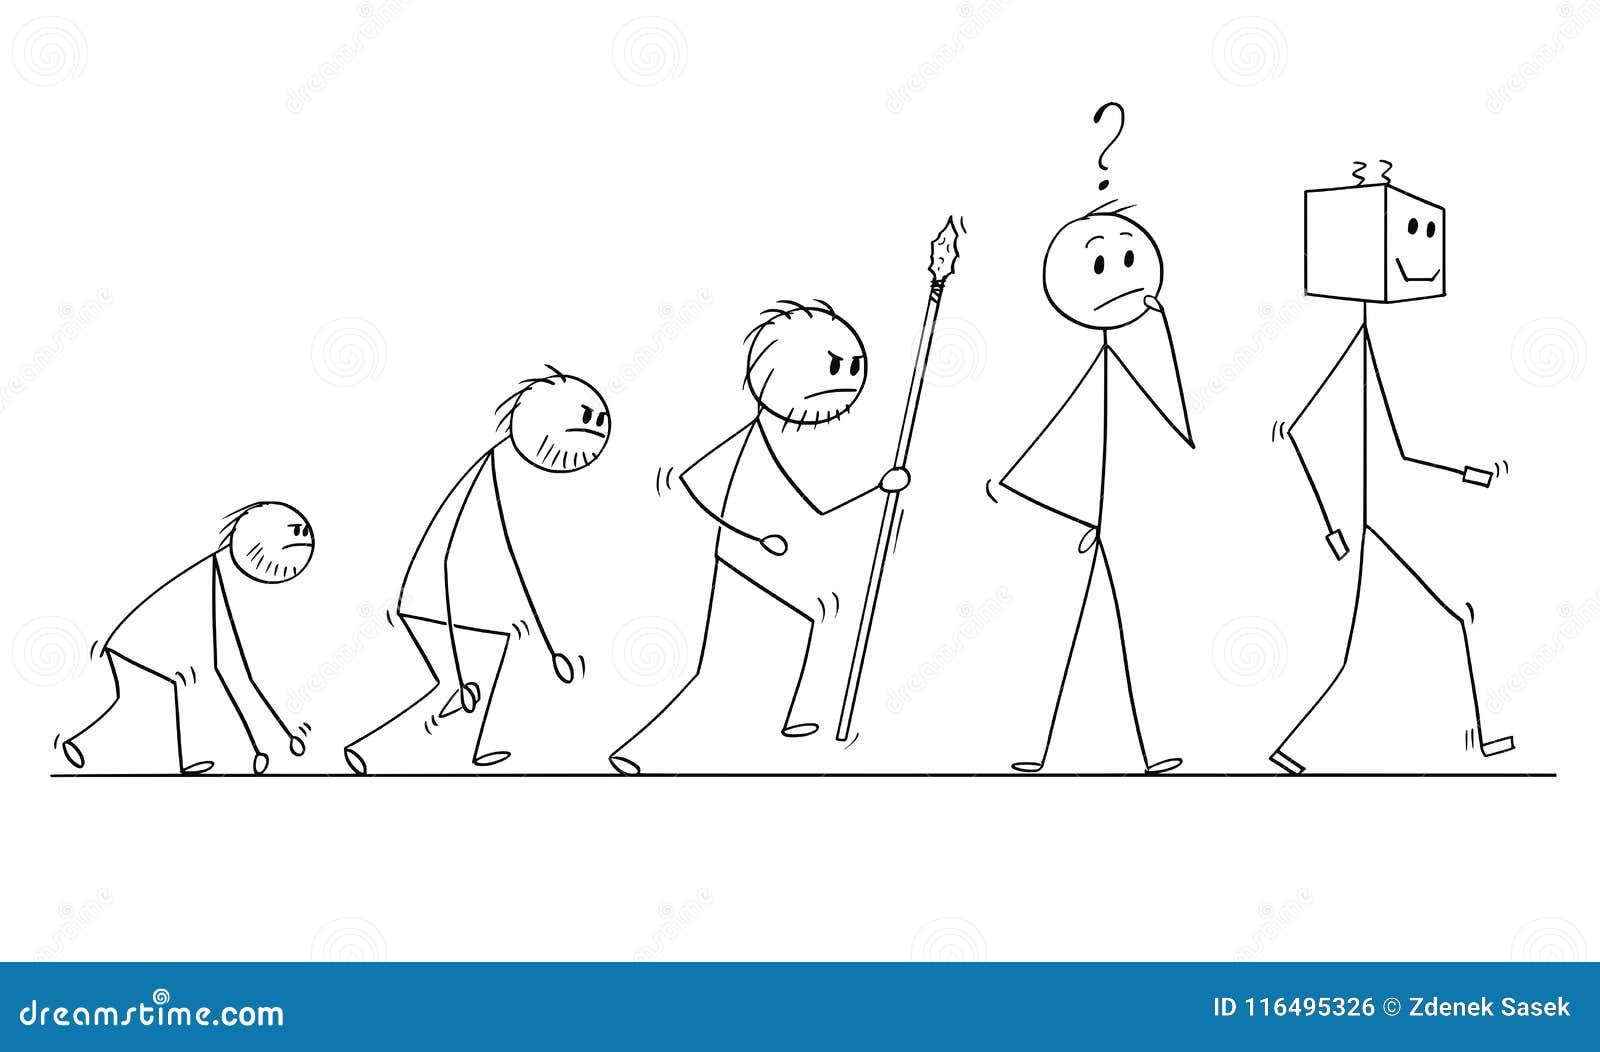 Cartoon Of Human Evolution Process Progress, Successor Of ...